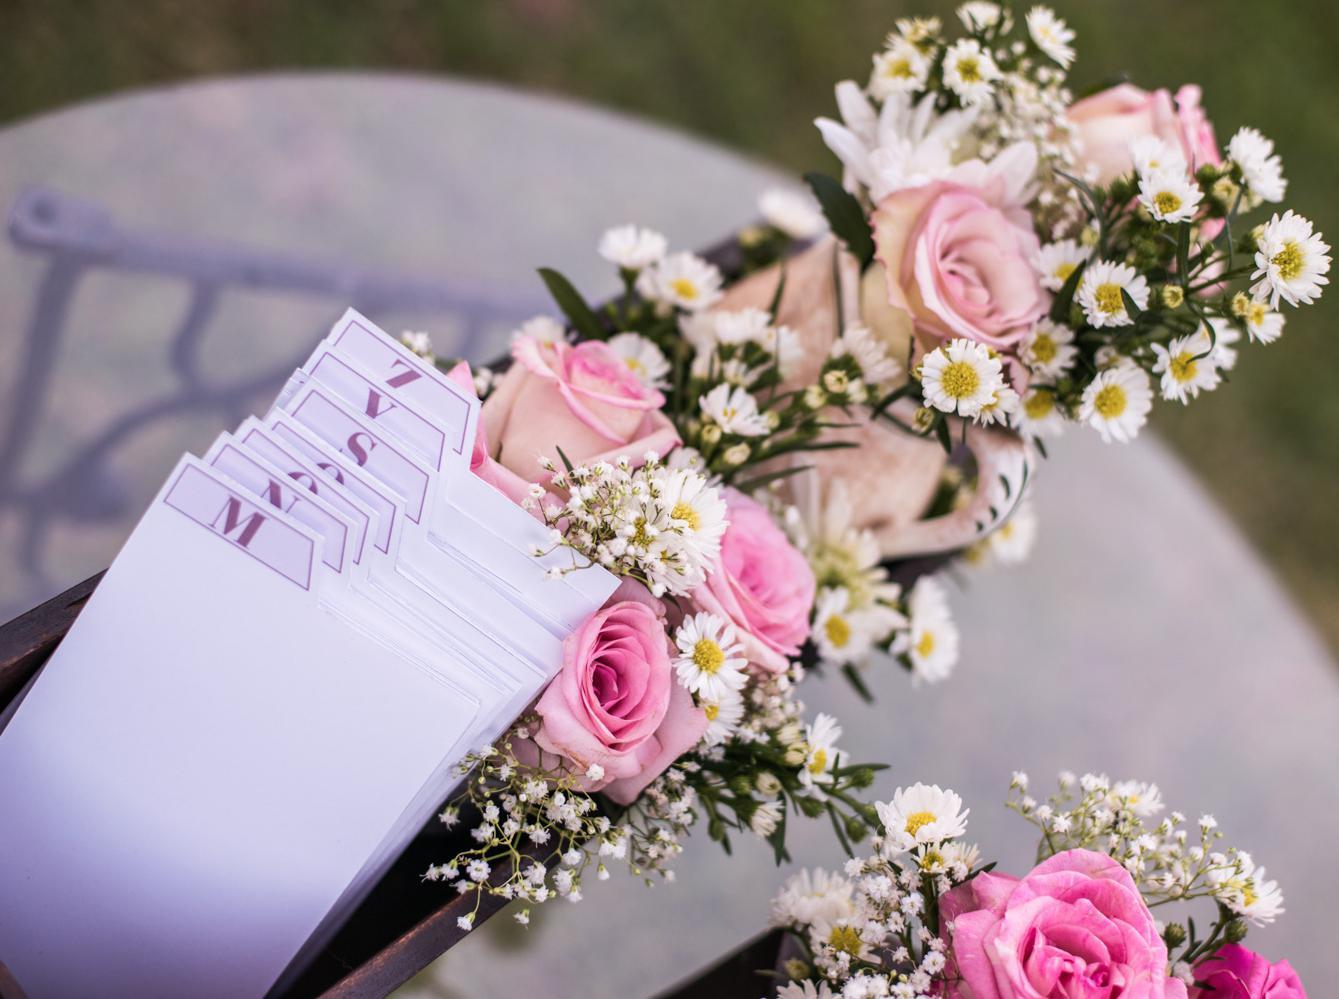 bodas-sin-clasificar-sin-tema-cuba-27662.jpg